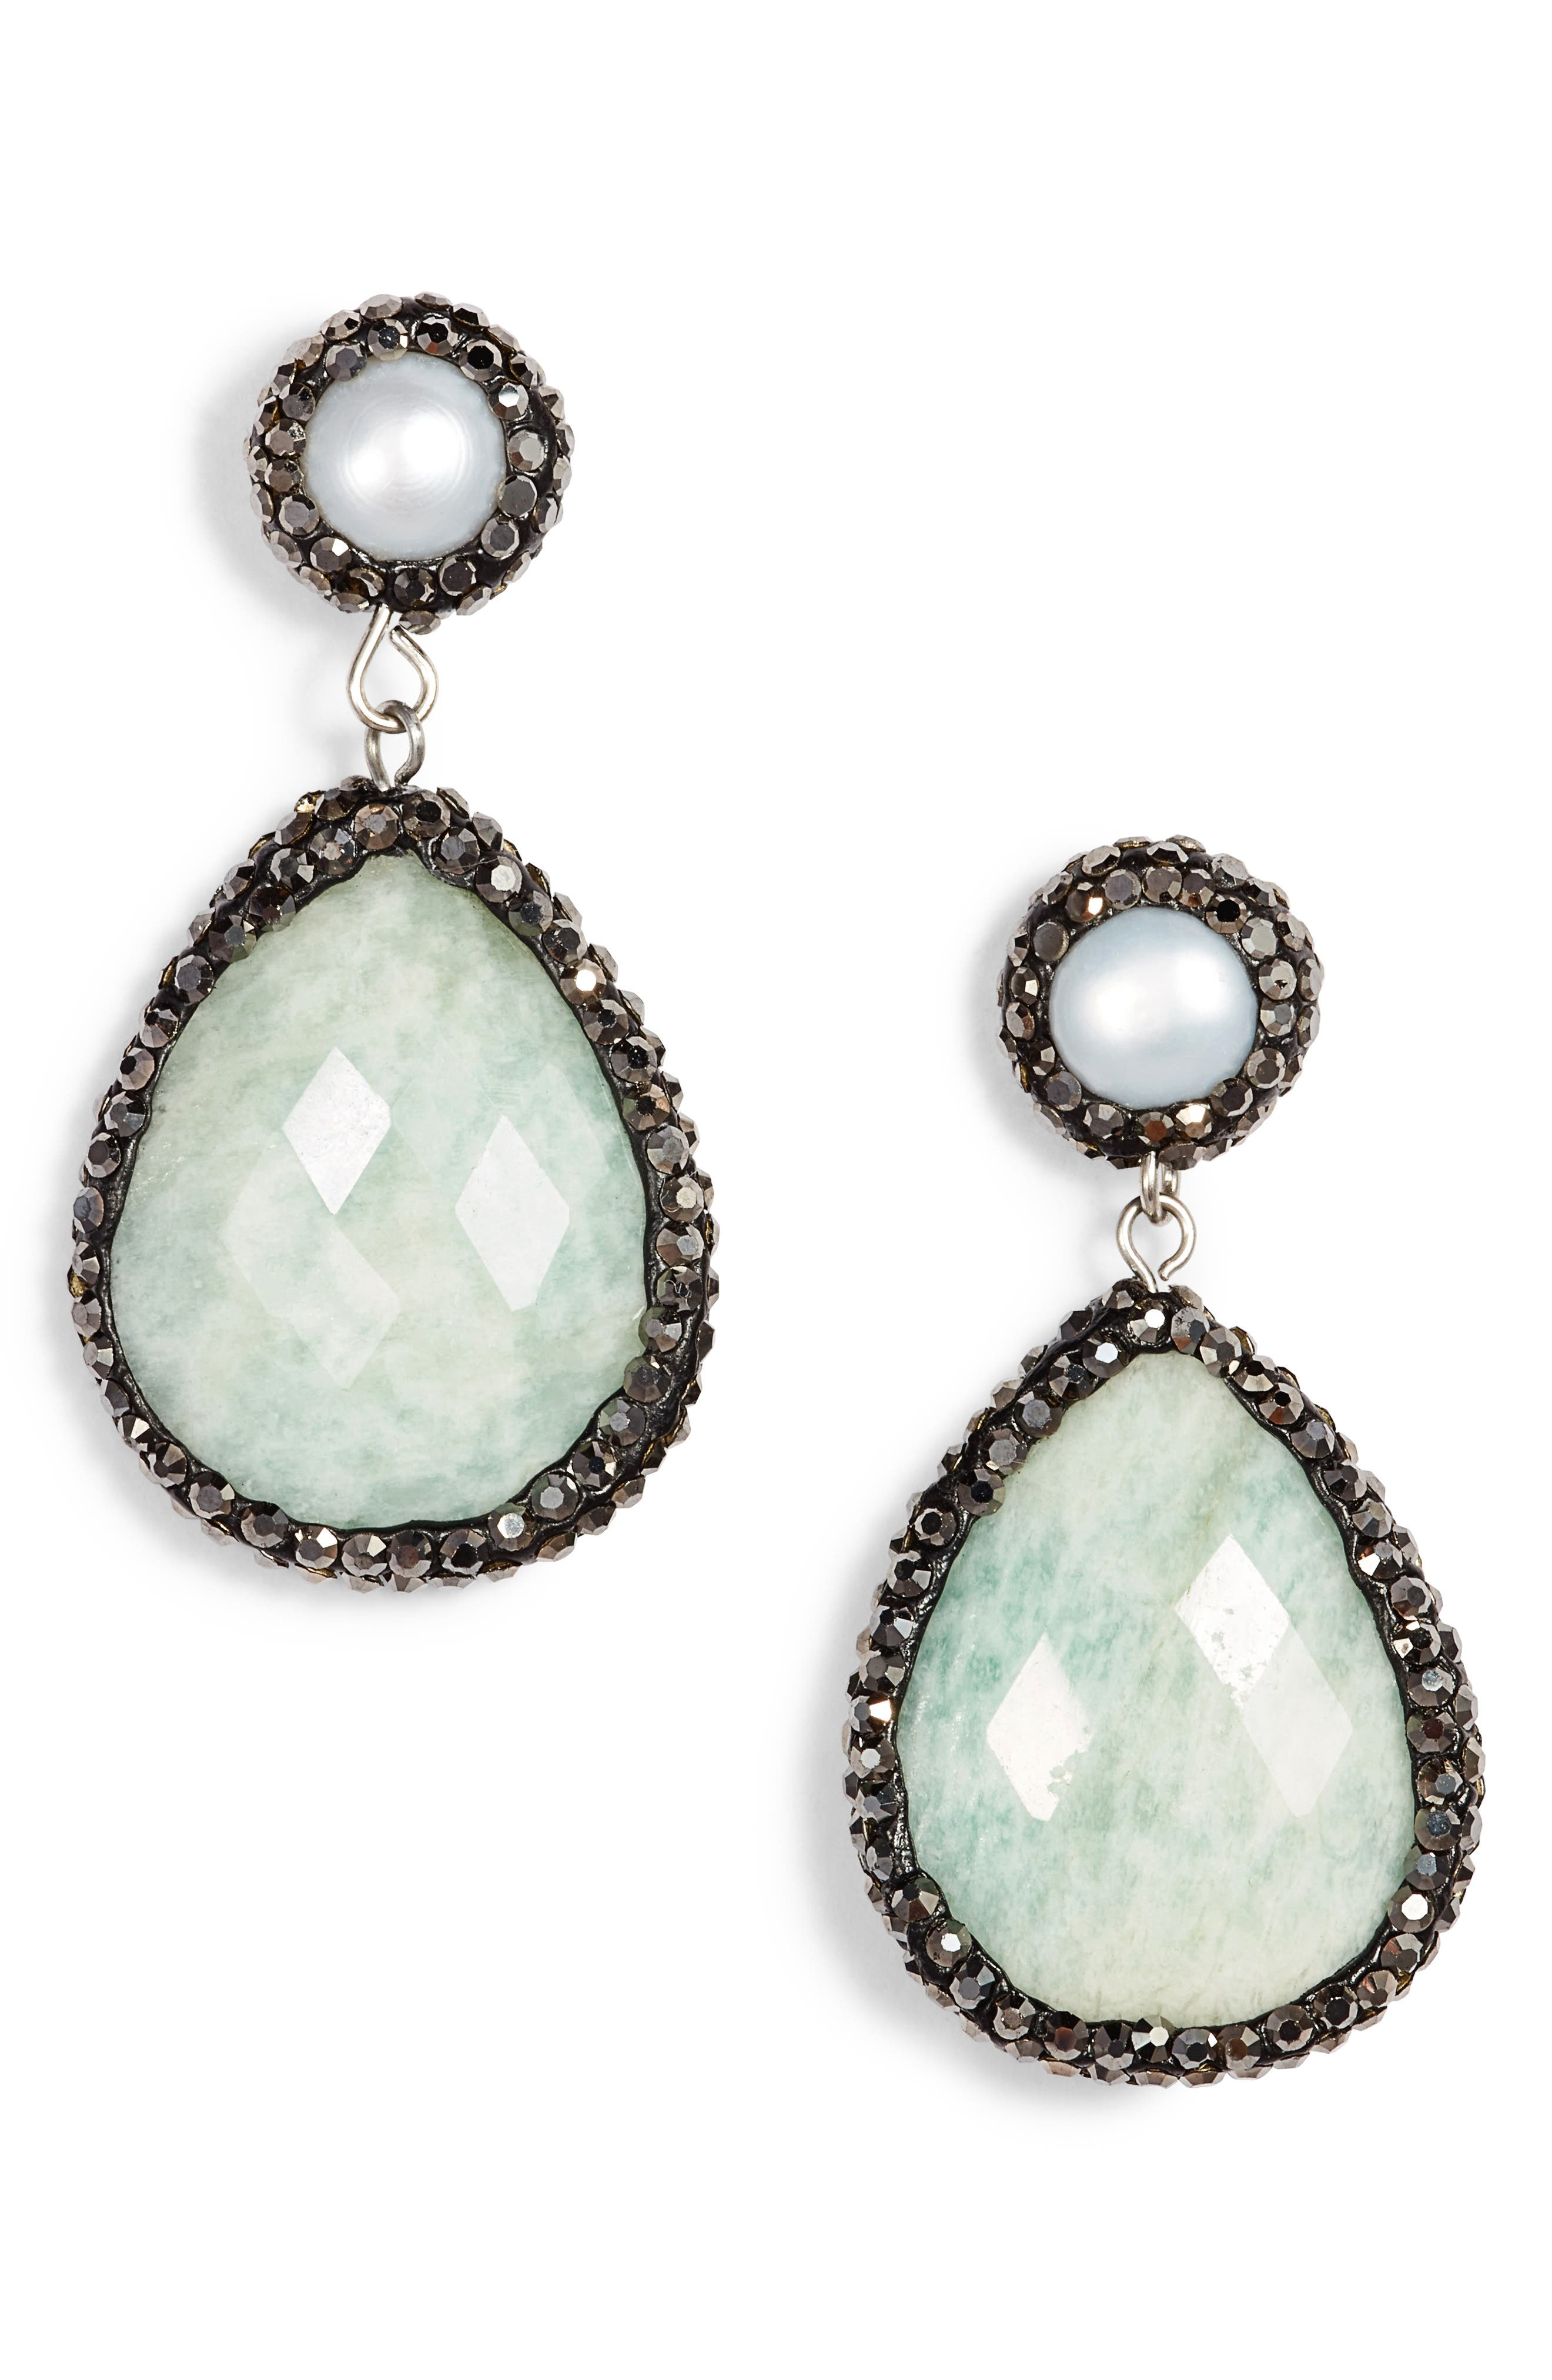 Saintes Semiprecious Drop Earrings,                         Main,                         color, Light Green Agate/ Pearl